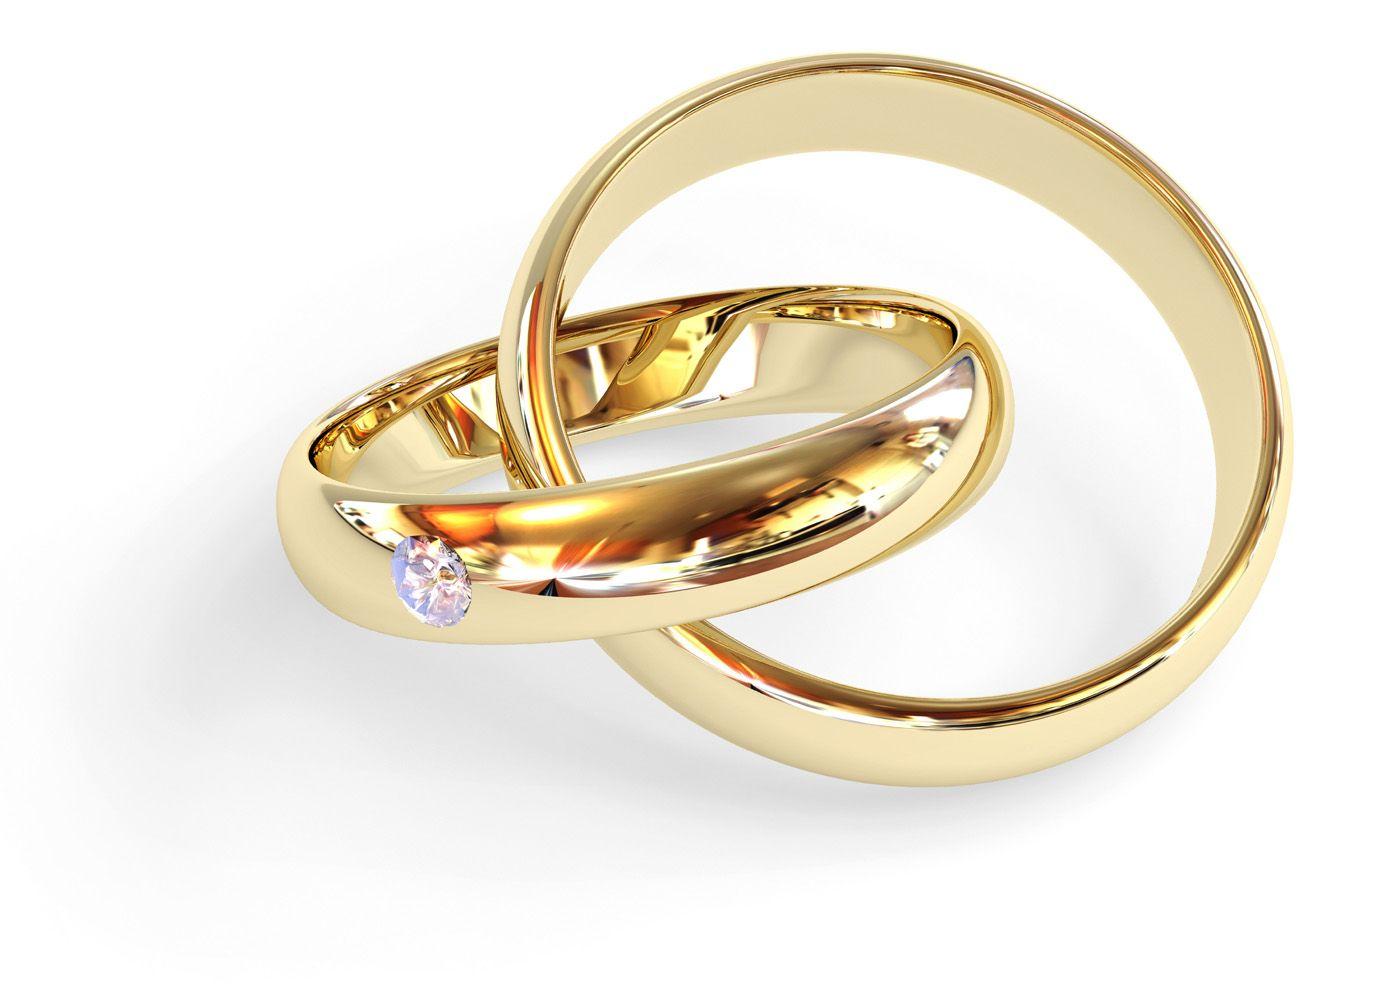 anillos de matrimonio wedding rings wedding photos pictures by weddingsofjoycom - Ring Wedding